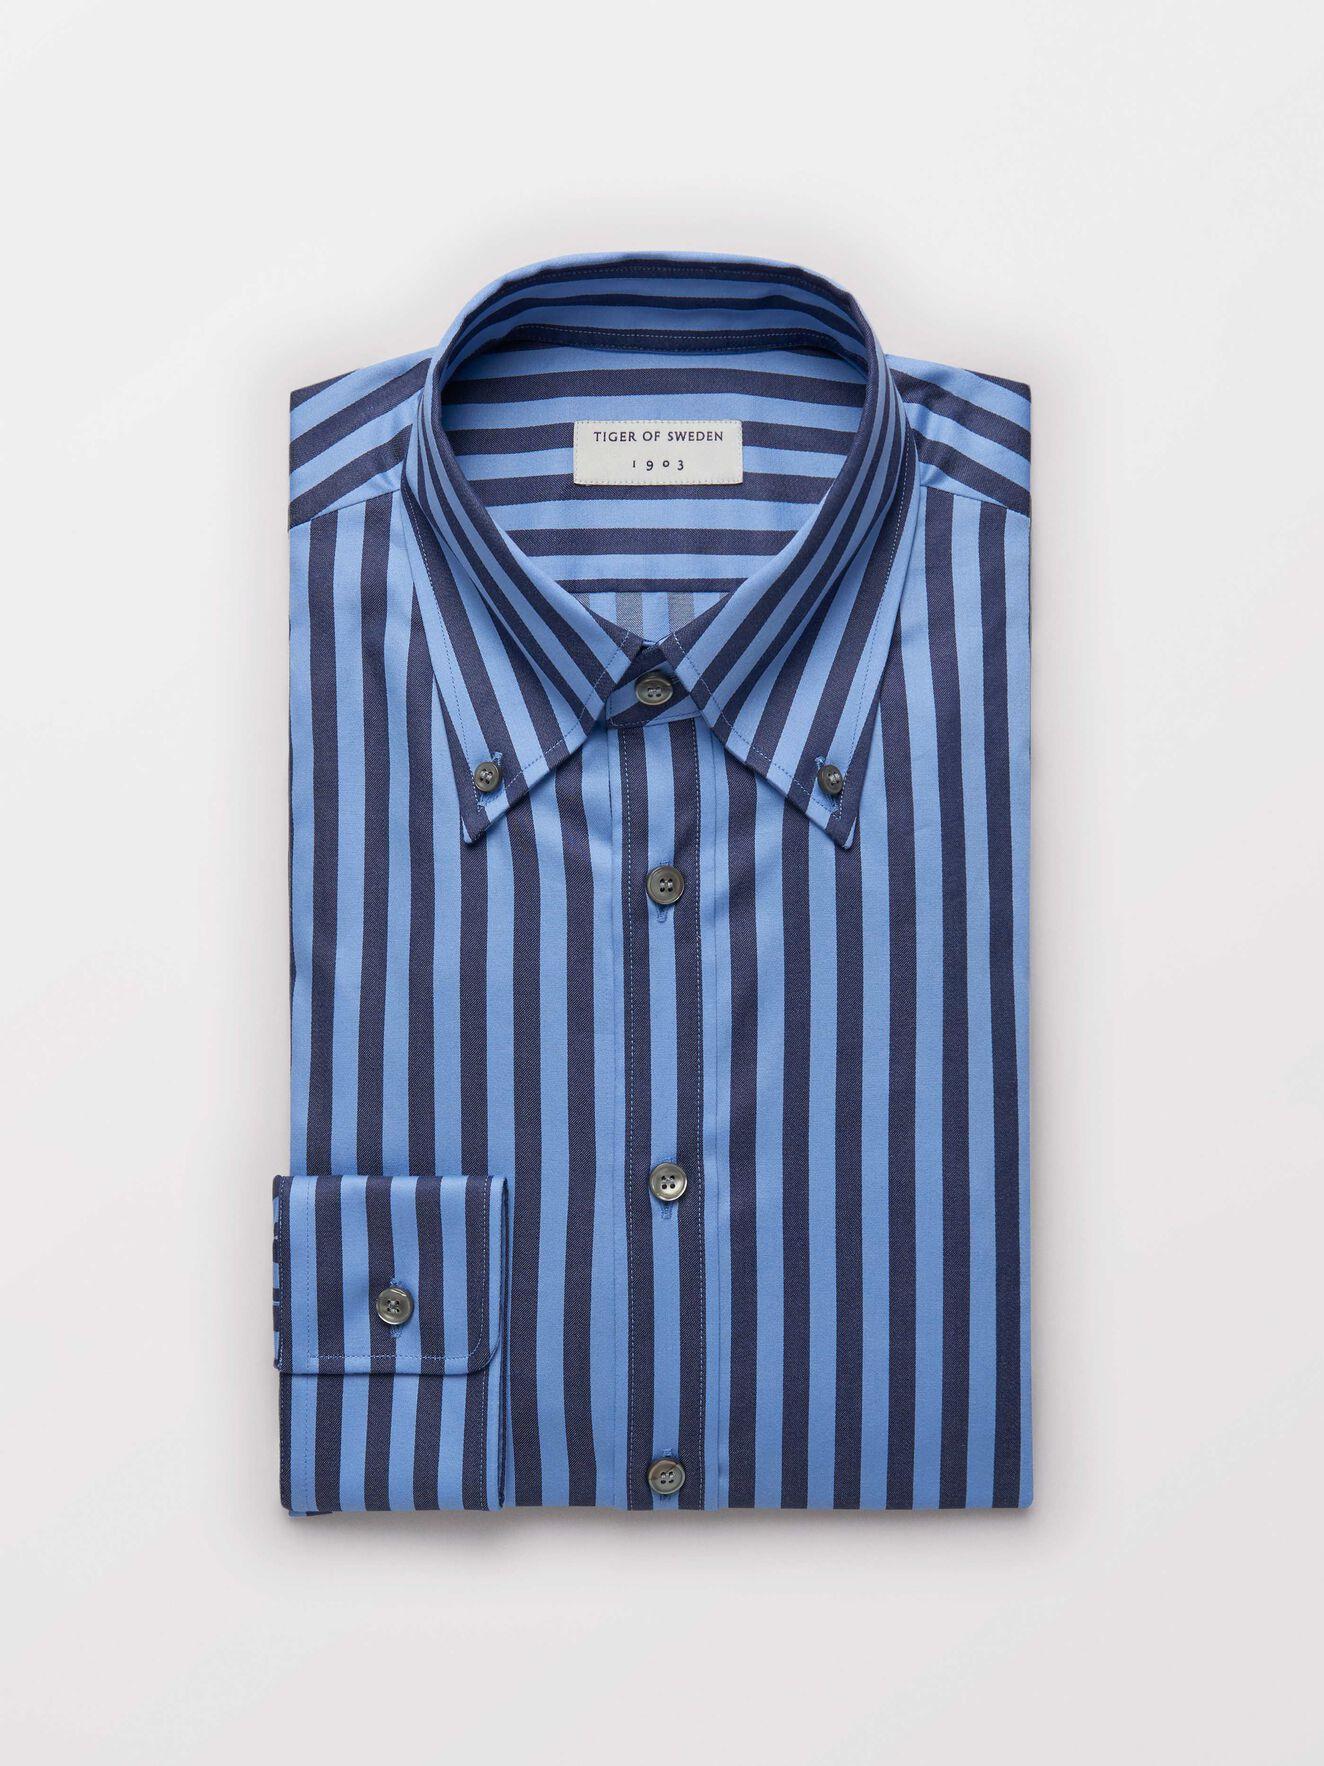 Fablo Shirt in Light blue from Tiger of Sweden